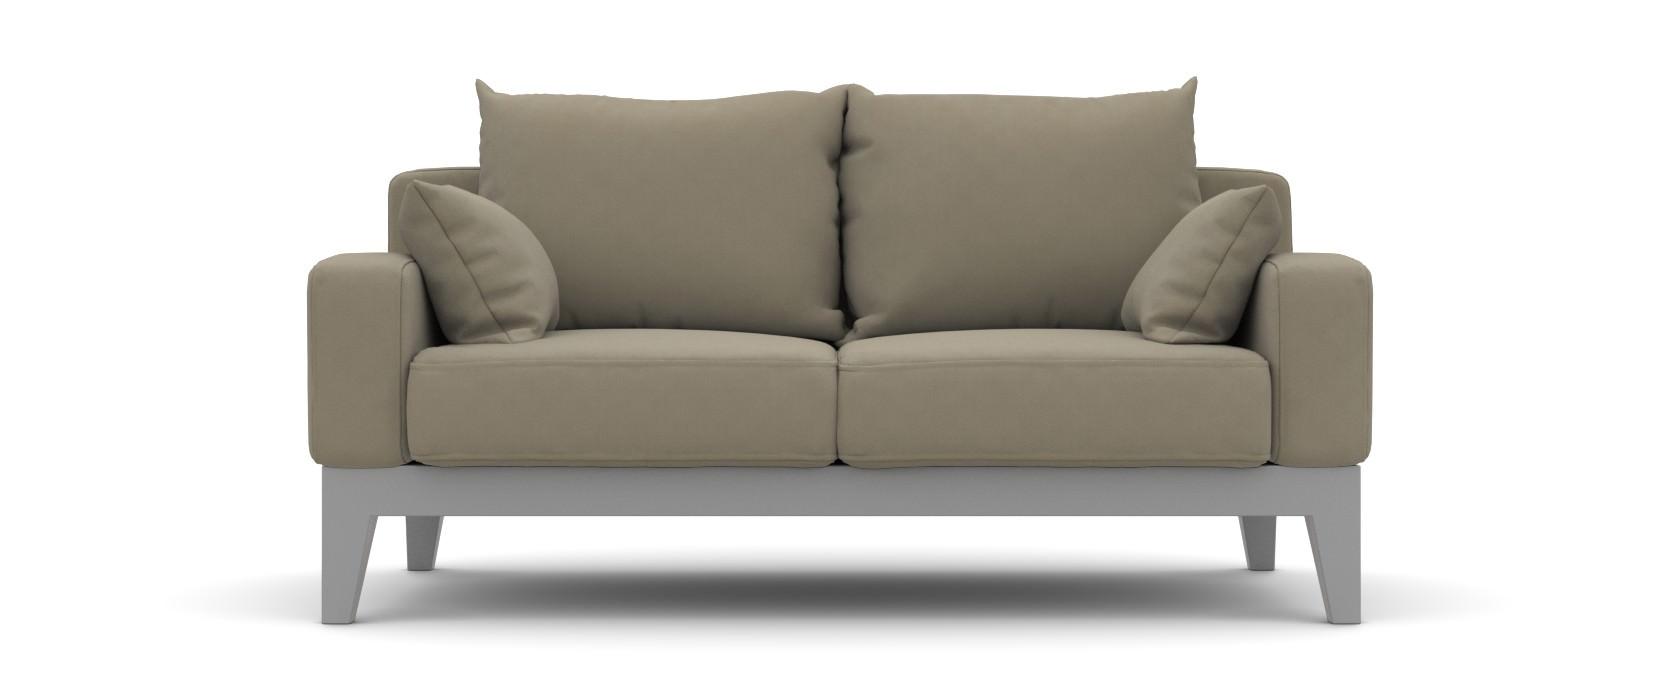 Двухместный диван Antonio - Фото 1 - Pufetto